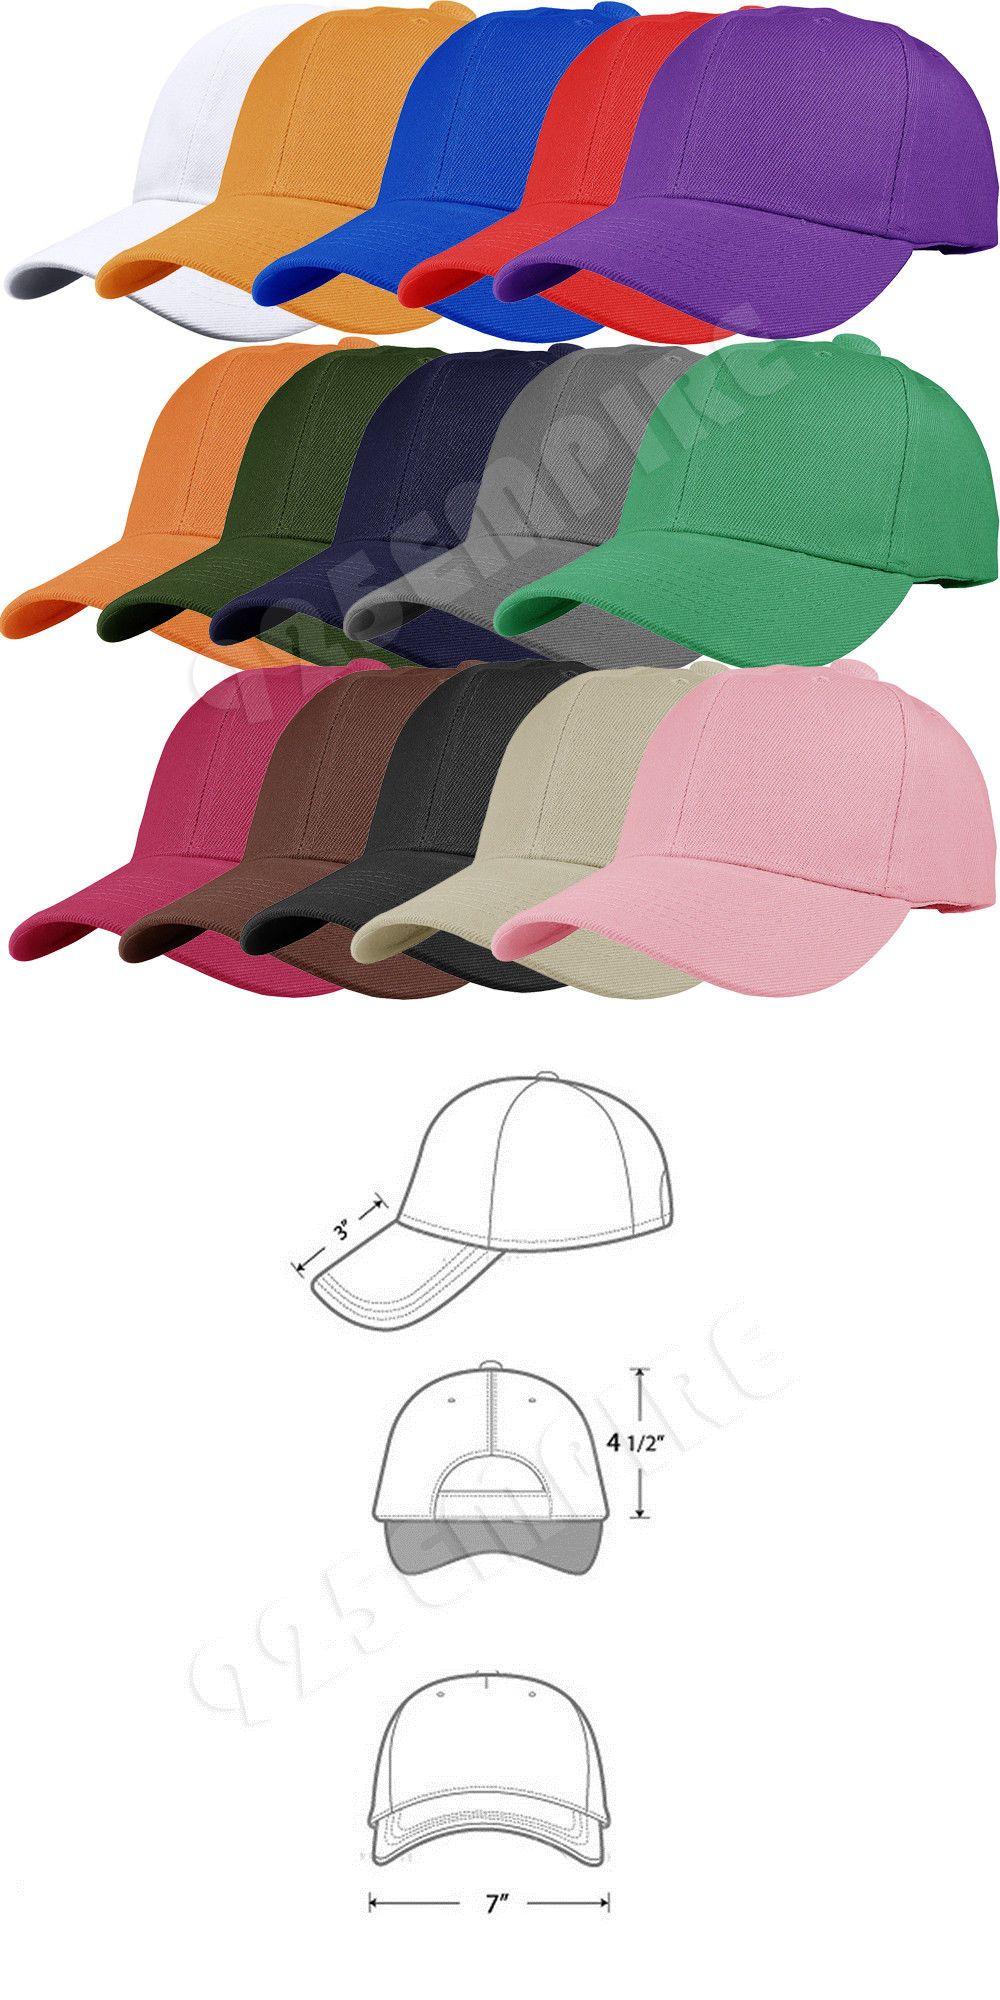 Hats 52365  12 Pcs Wholesale Lot Plain Solid Color Adjustable Baseball Cap  Hats -  BUY IT NOW ONLY   24 on  eBay  wholesale  plain  solid  color   adjustable ... 878ed66255eb